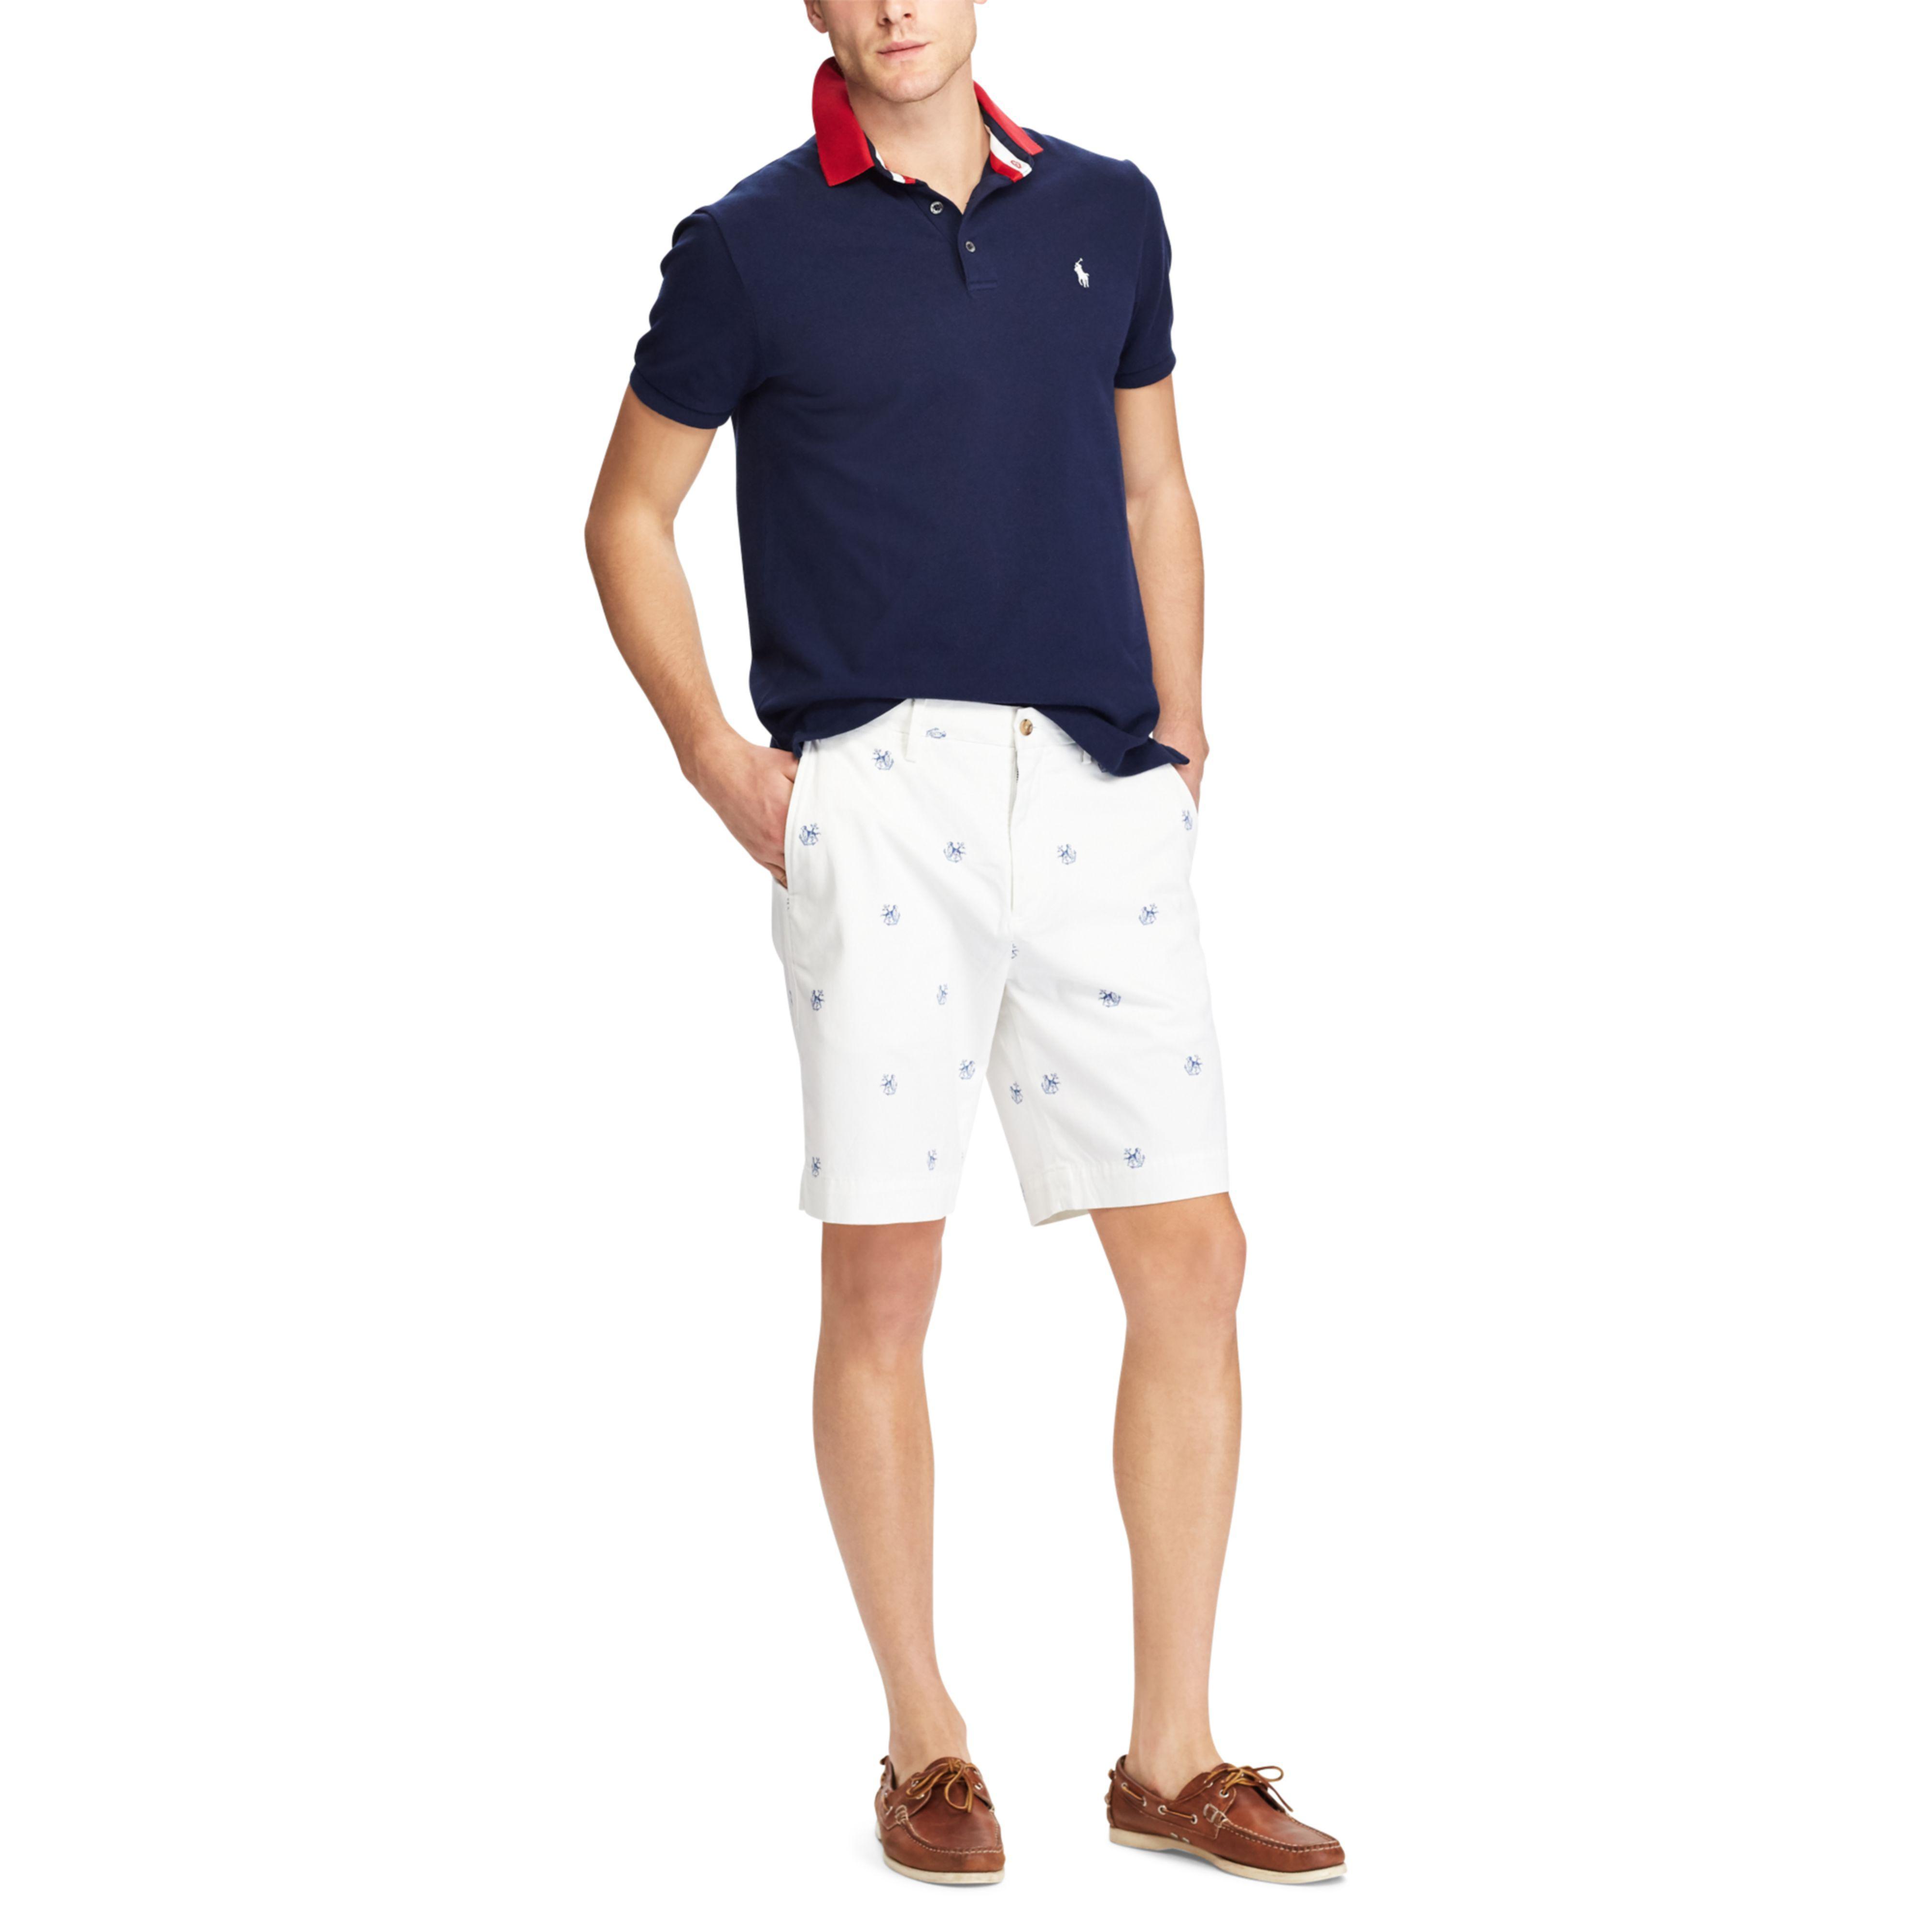 89022631647b6 ... shorts 31d77 61cf5  australia polo ralph lauren white stretch classic  fit short for men lyst. view fullscreen f760a